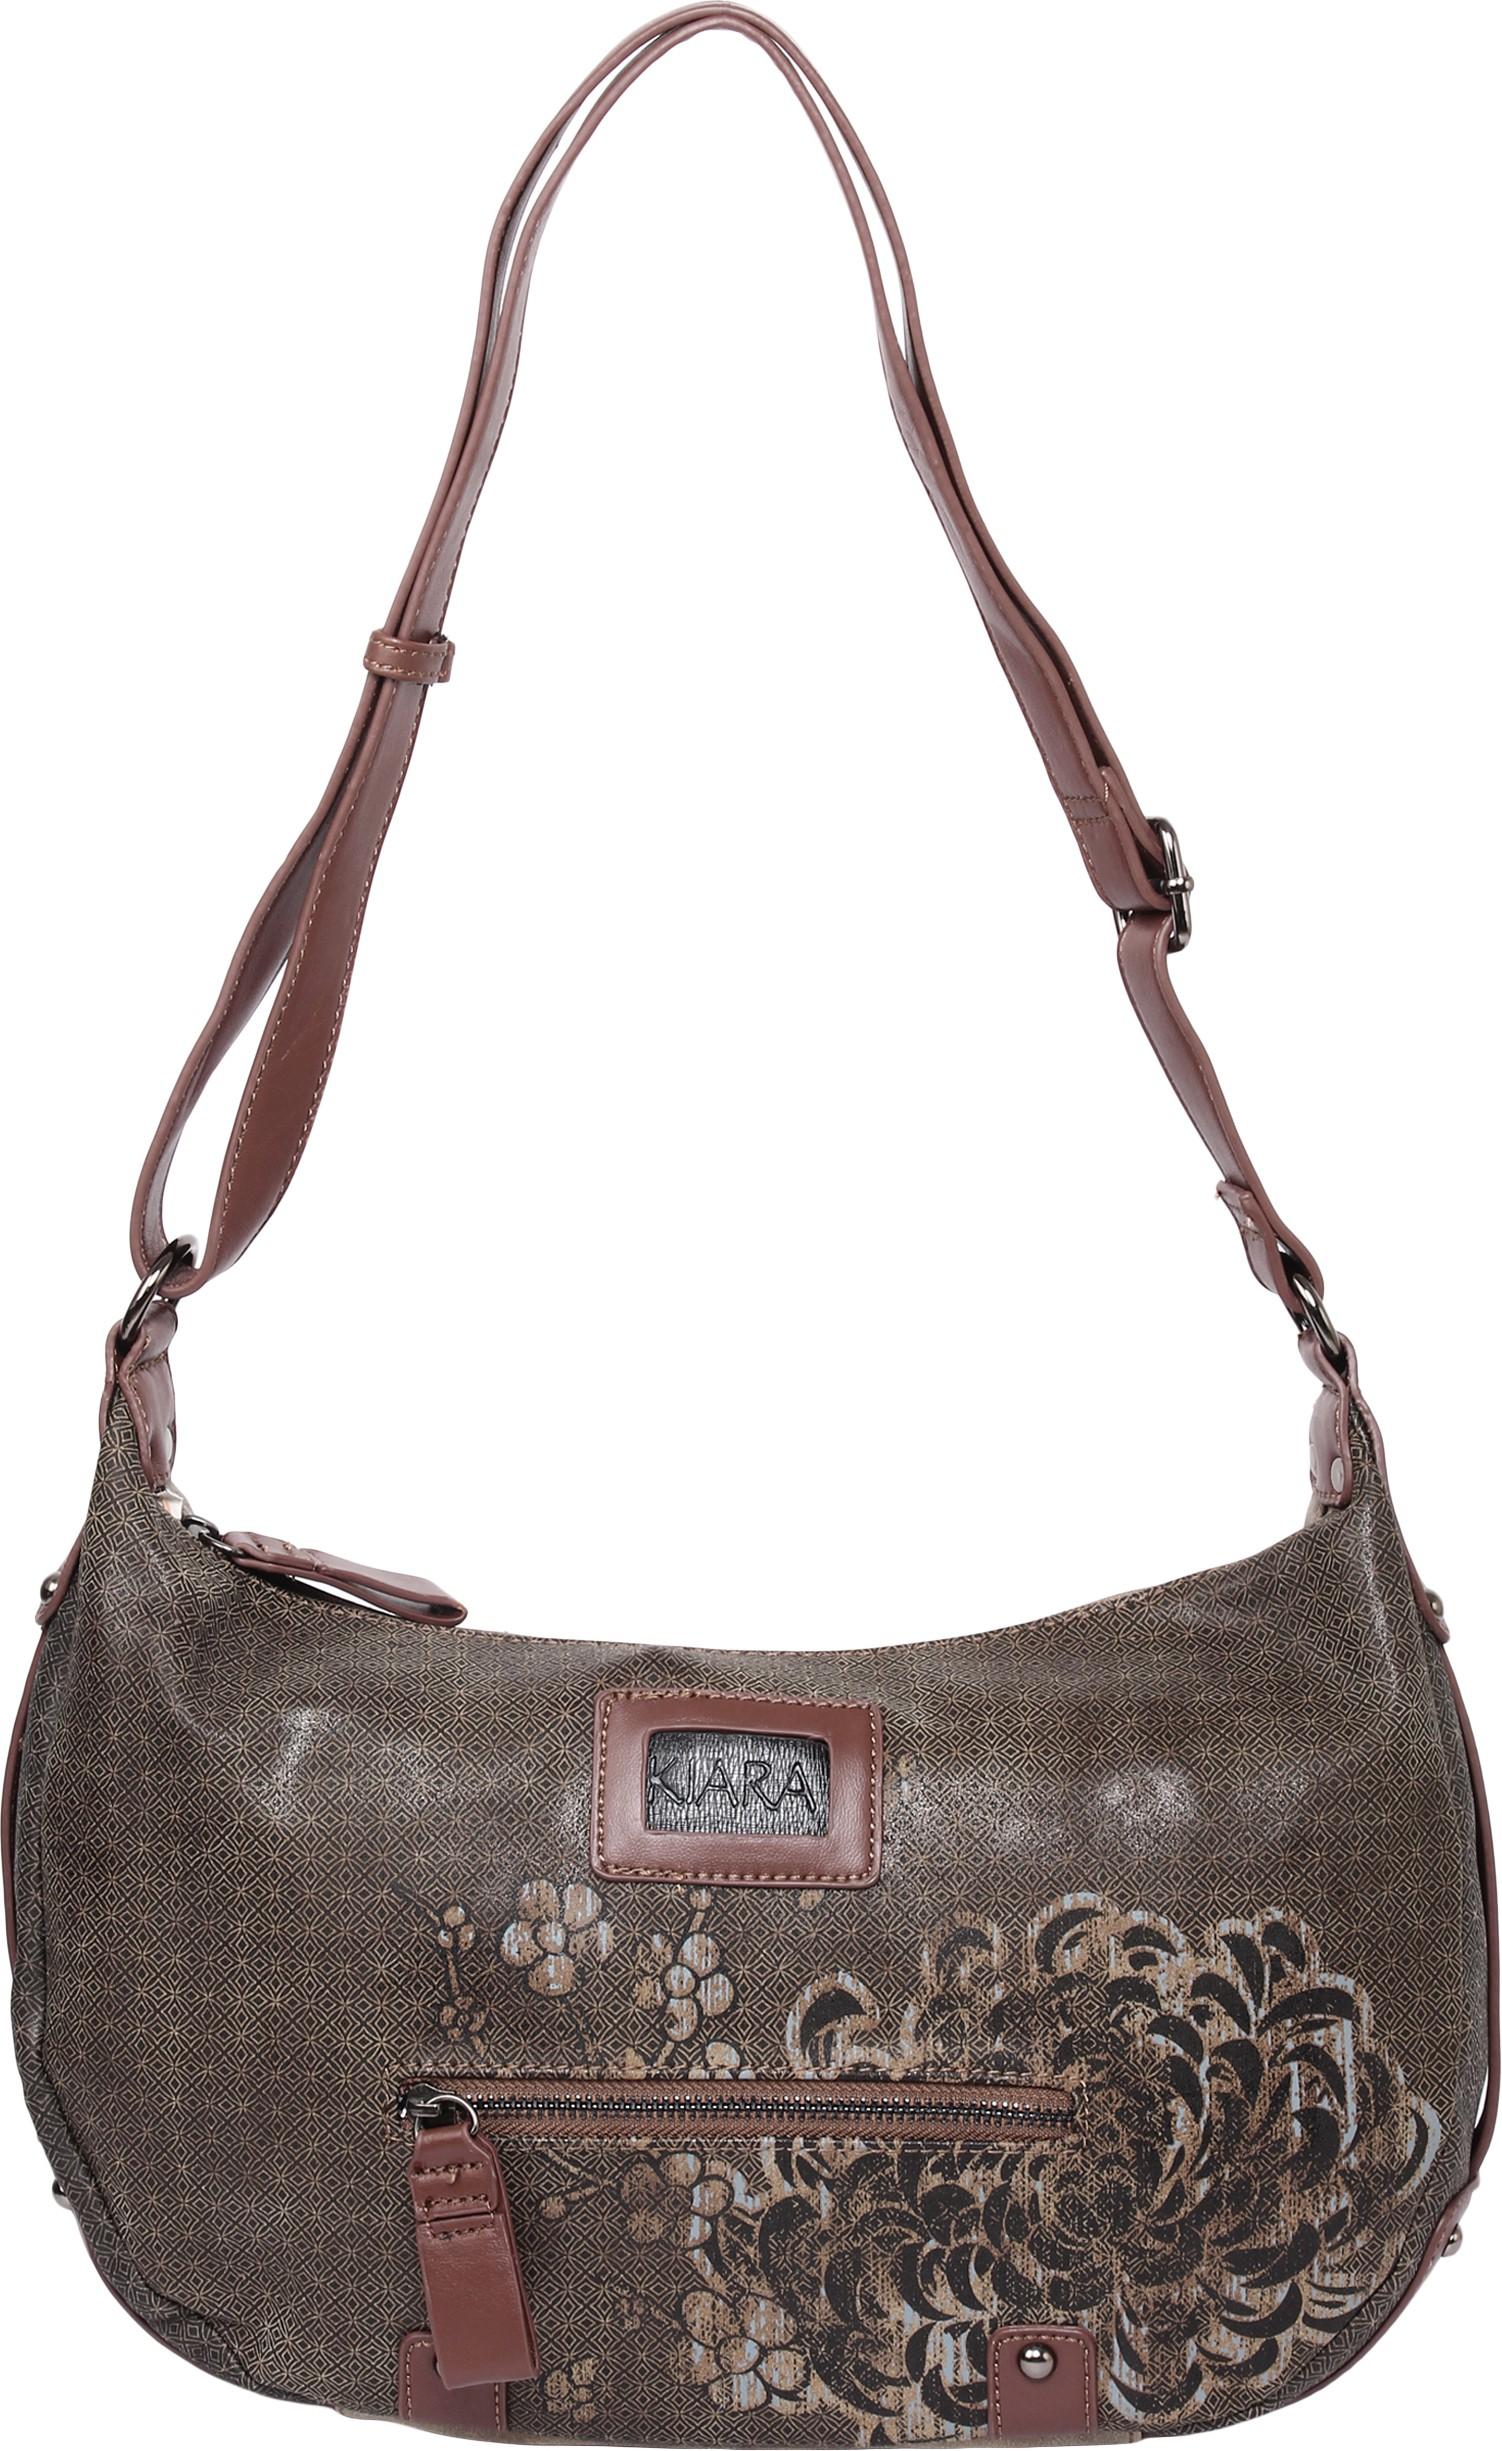 Flipkart - Bags, Wallets & Belts Minimum 80% off